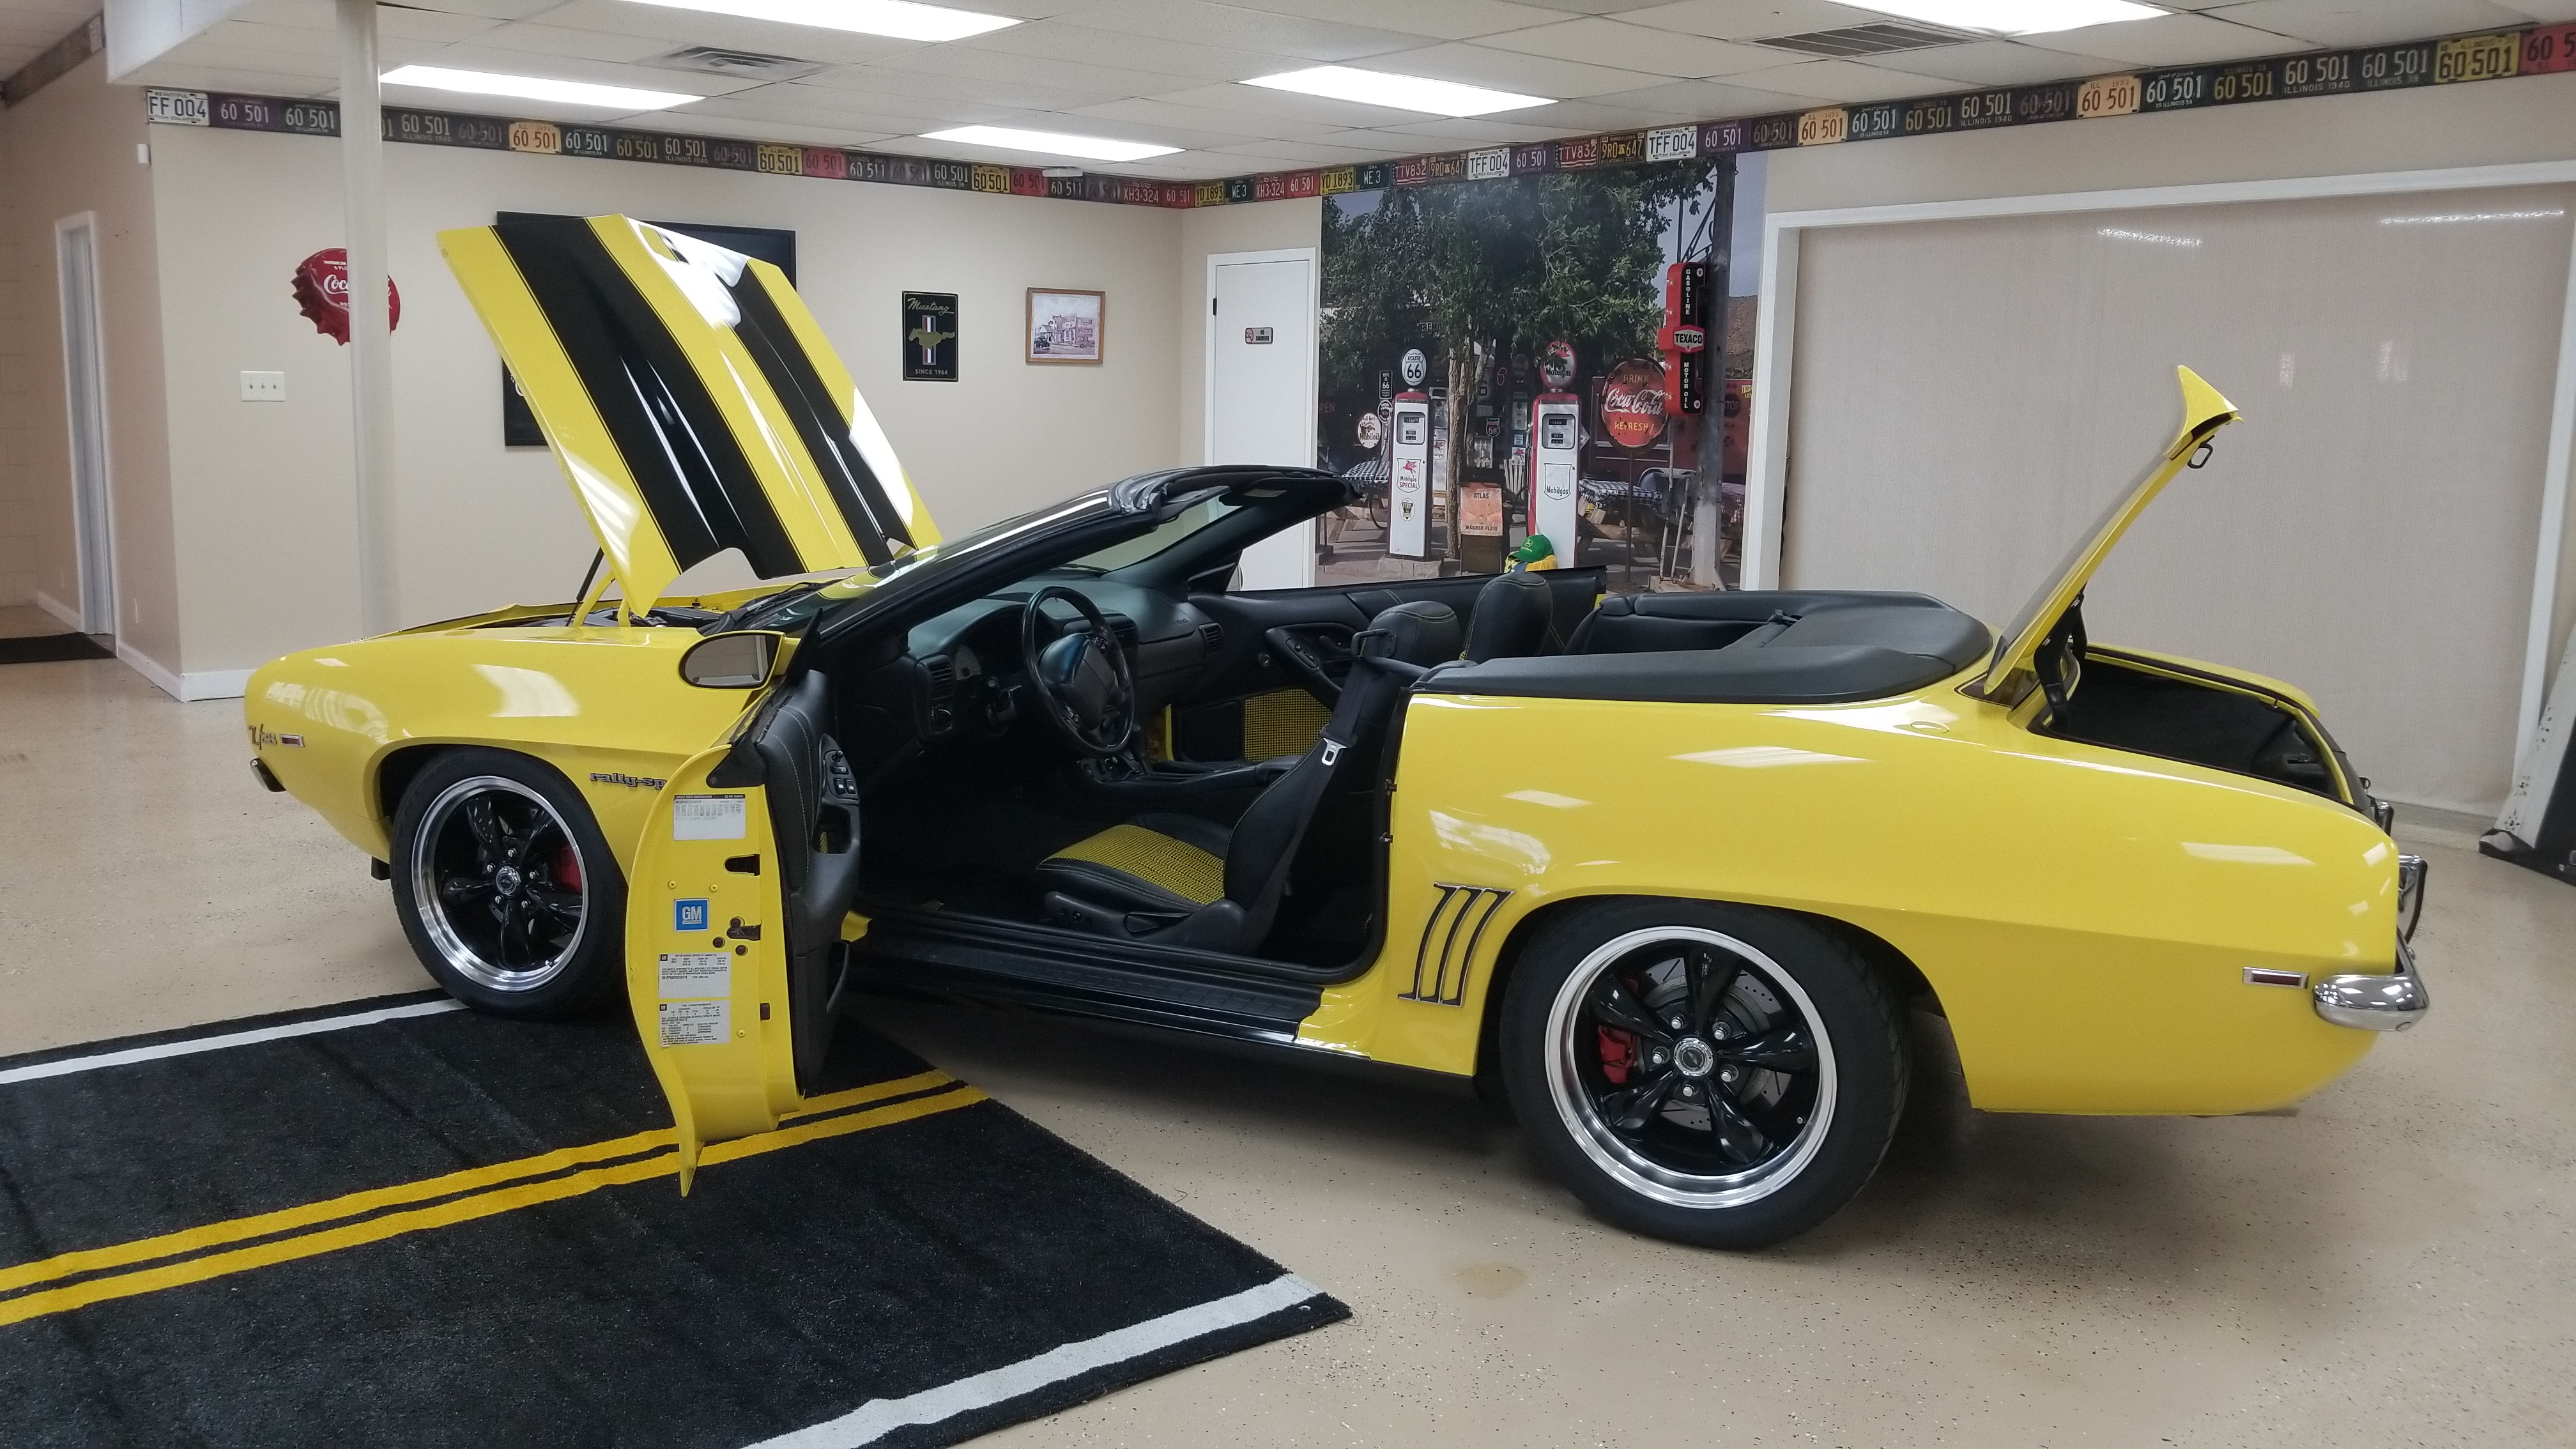 2002 Camaro, 1969 Camaro, Camaro Z-28, Hybrid, Restomod,resto-mod,Southern Classic Car,Southern Classic Cars, southernclassiccar.com,black and yellow, Henderson NC